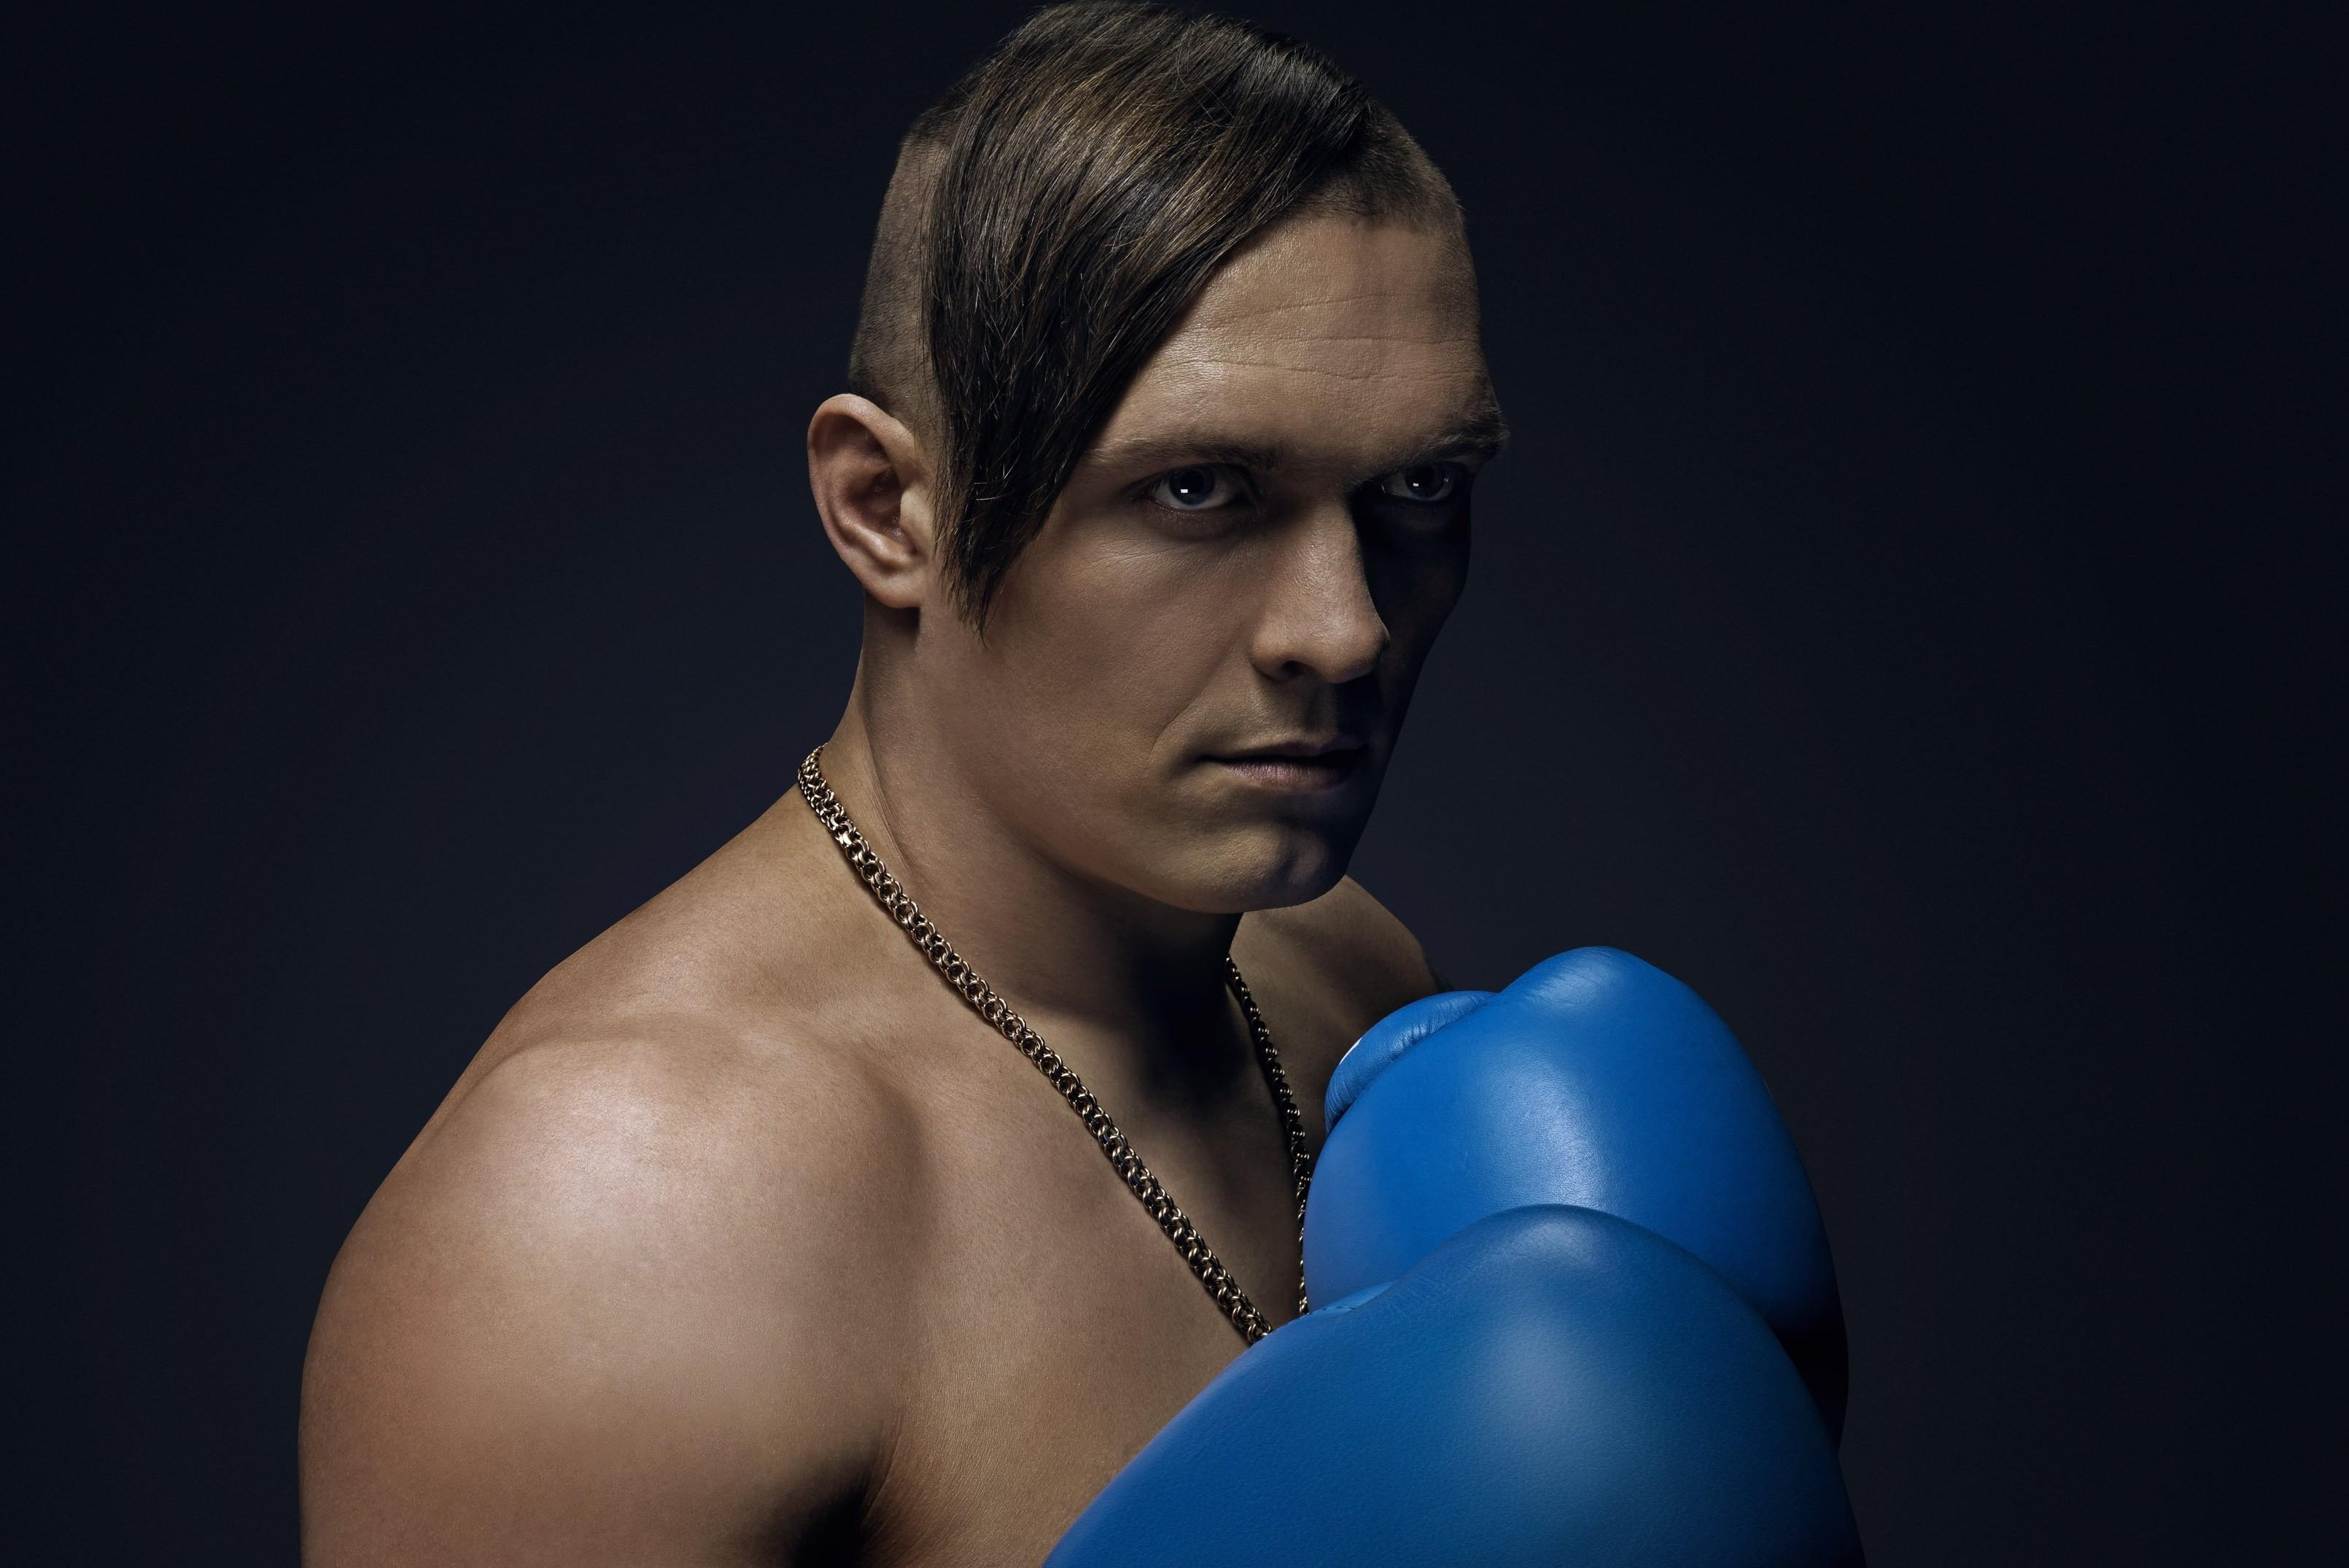 Украинскому боксеру Александру Усику посоветовали